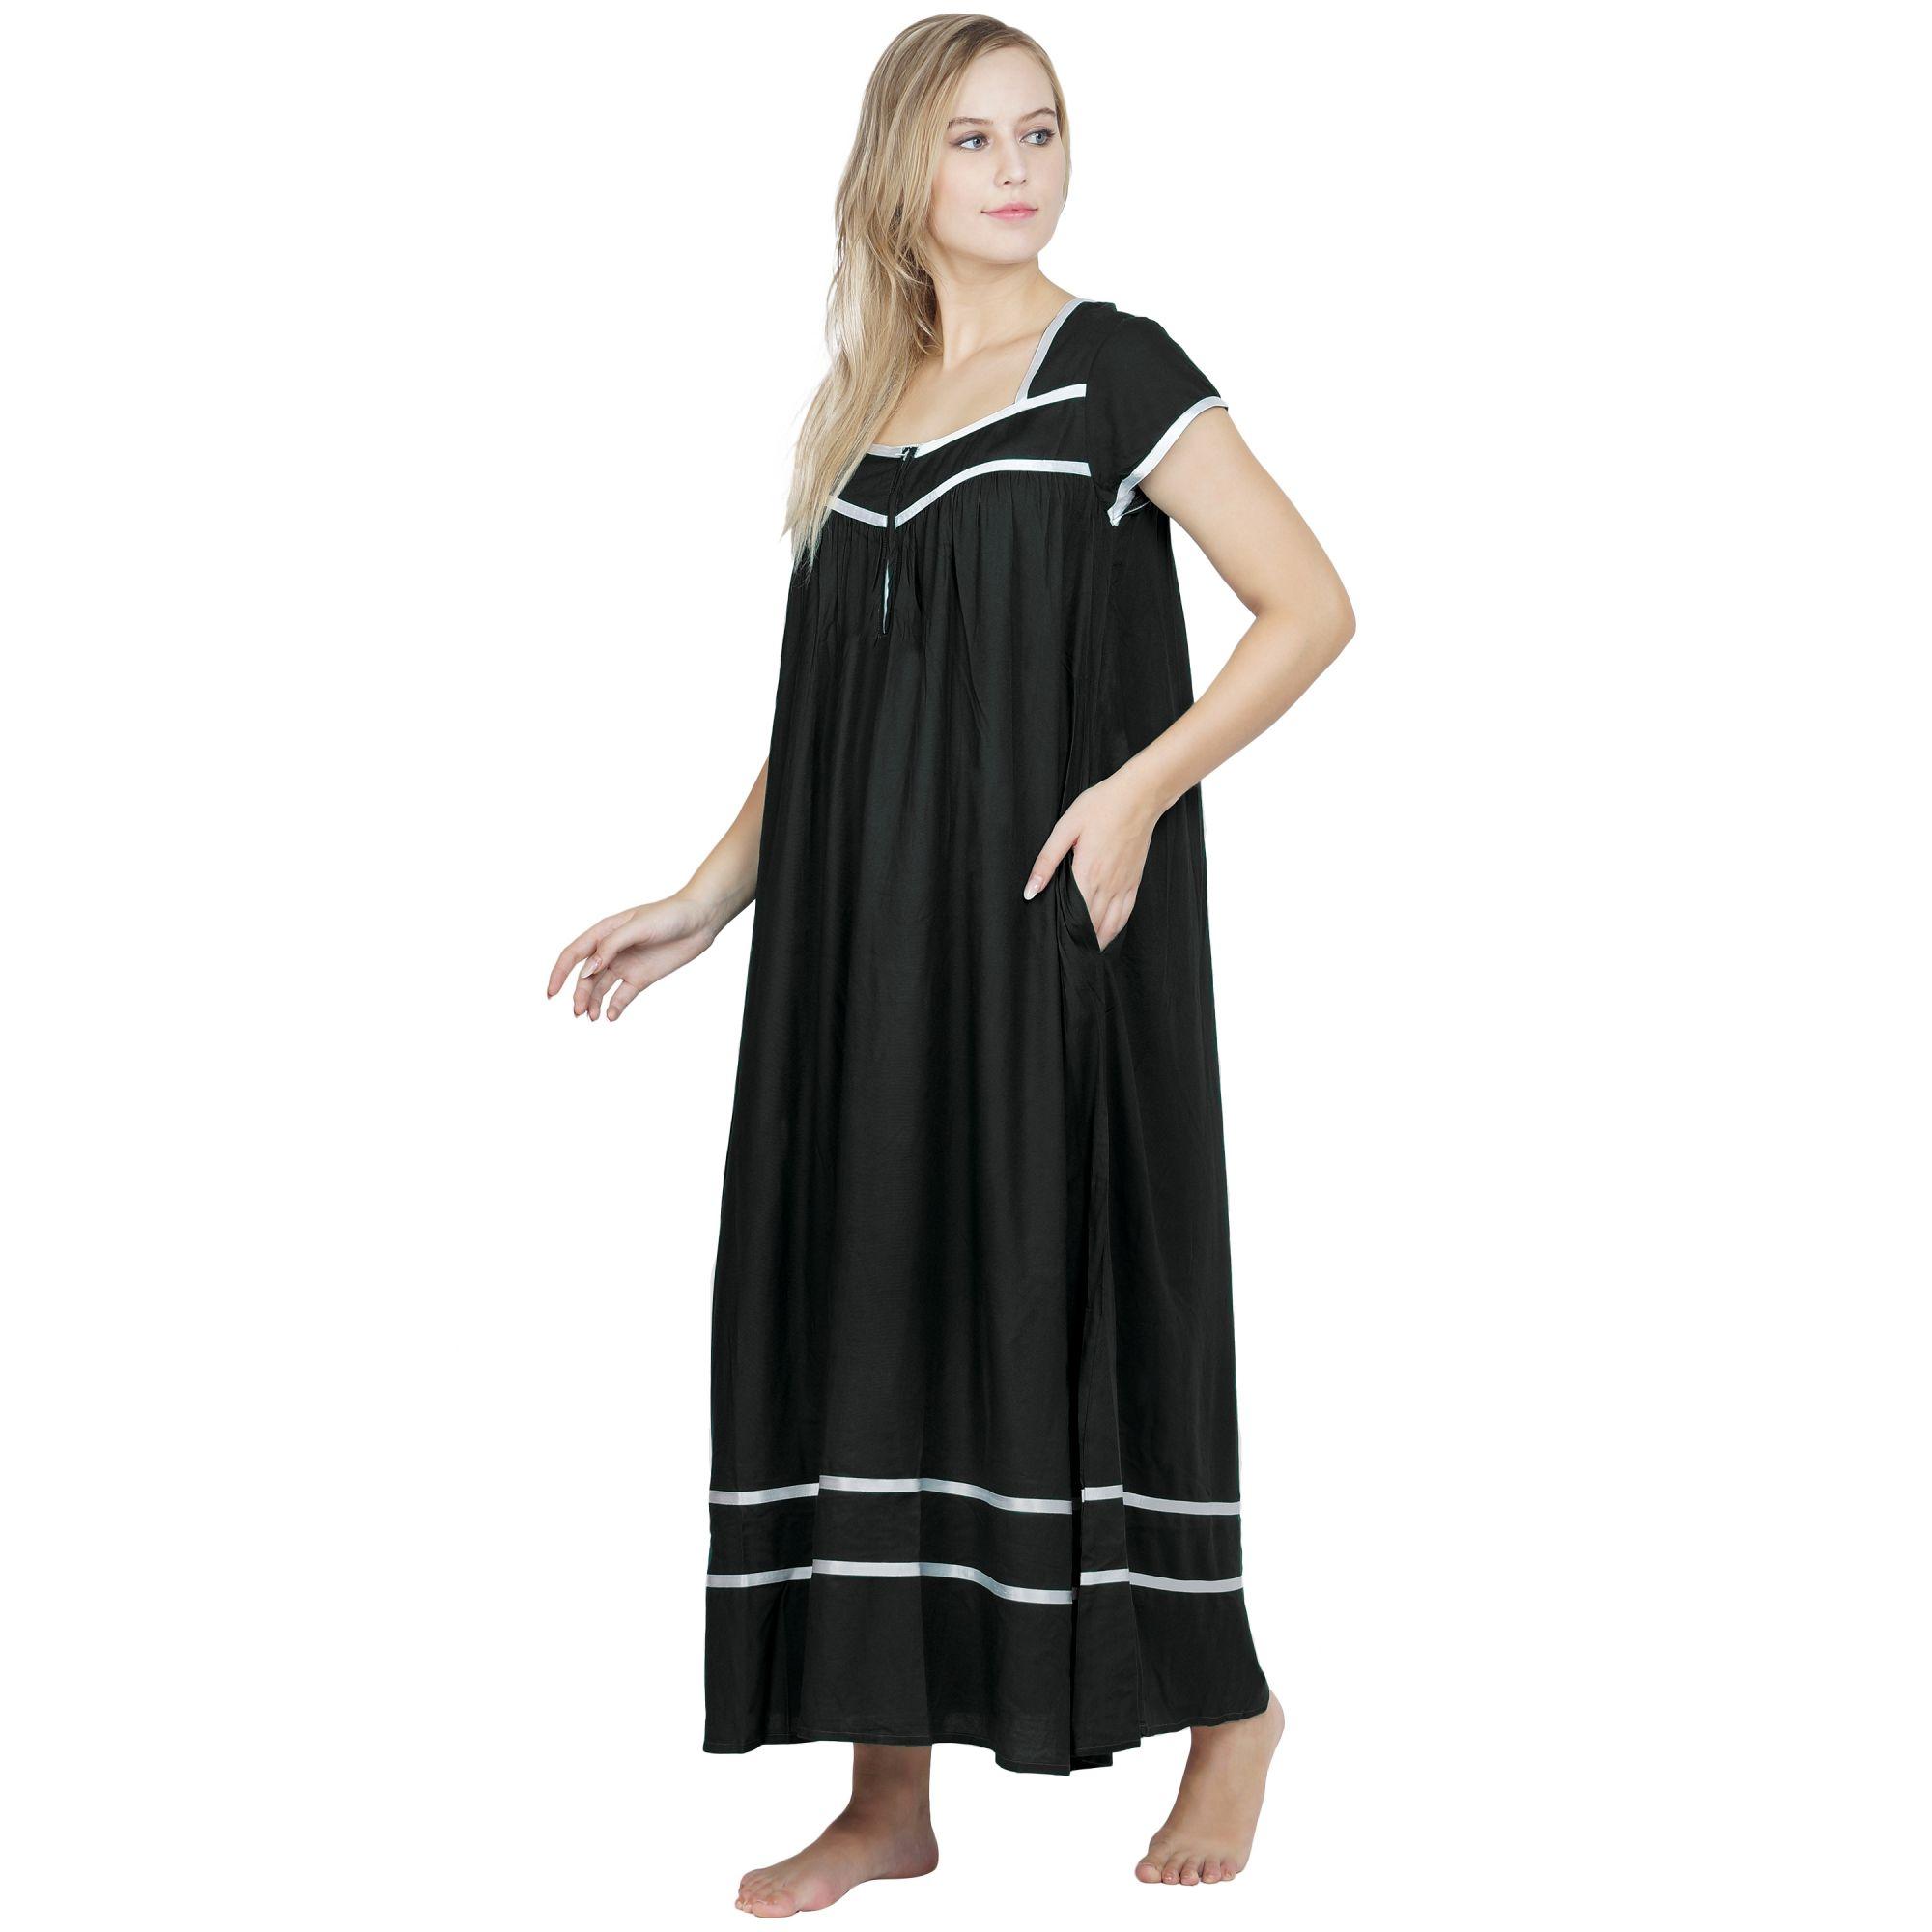 Embellished Stylish Front Zip Nighty in Black